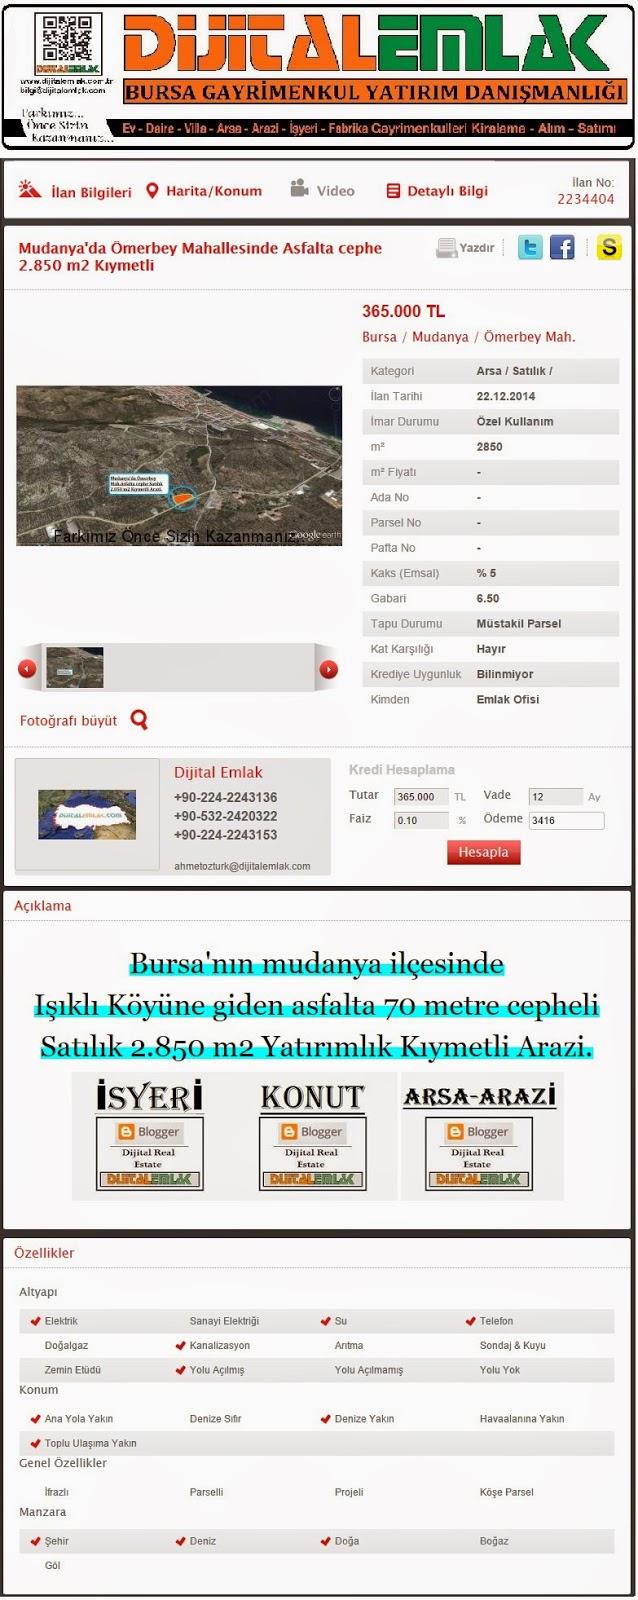 http://www.dijitalemlak.com.tr/ilan/2234404_mudanyada-omerbey-mahallesinde-asfalta-cephe-2850-m2-kiymetli.html